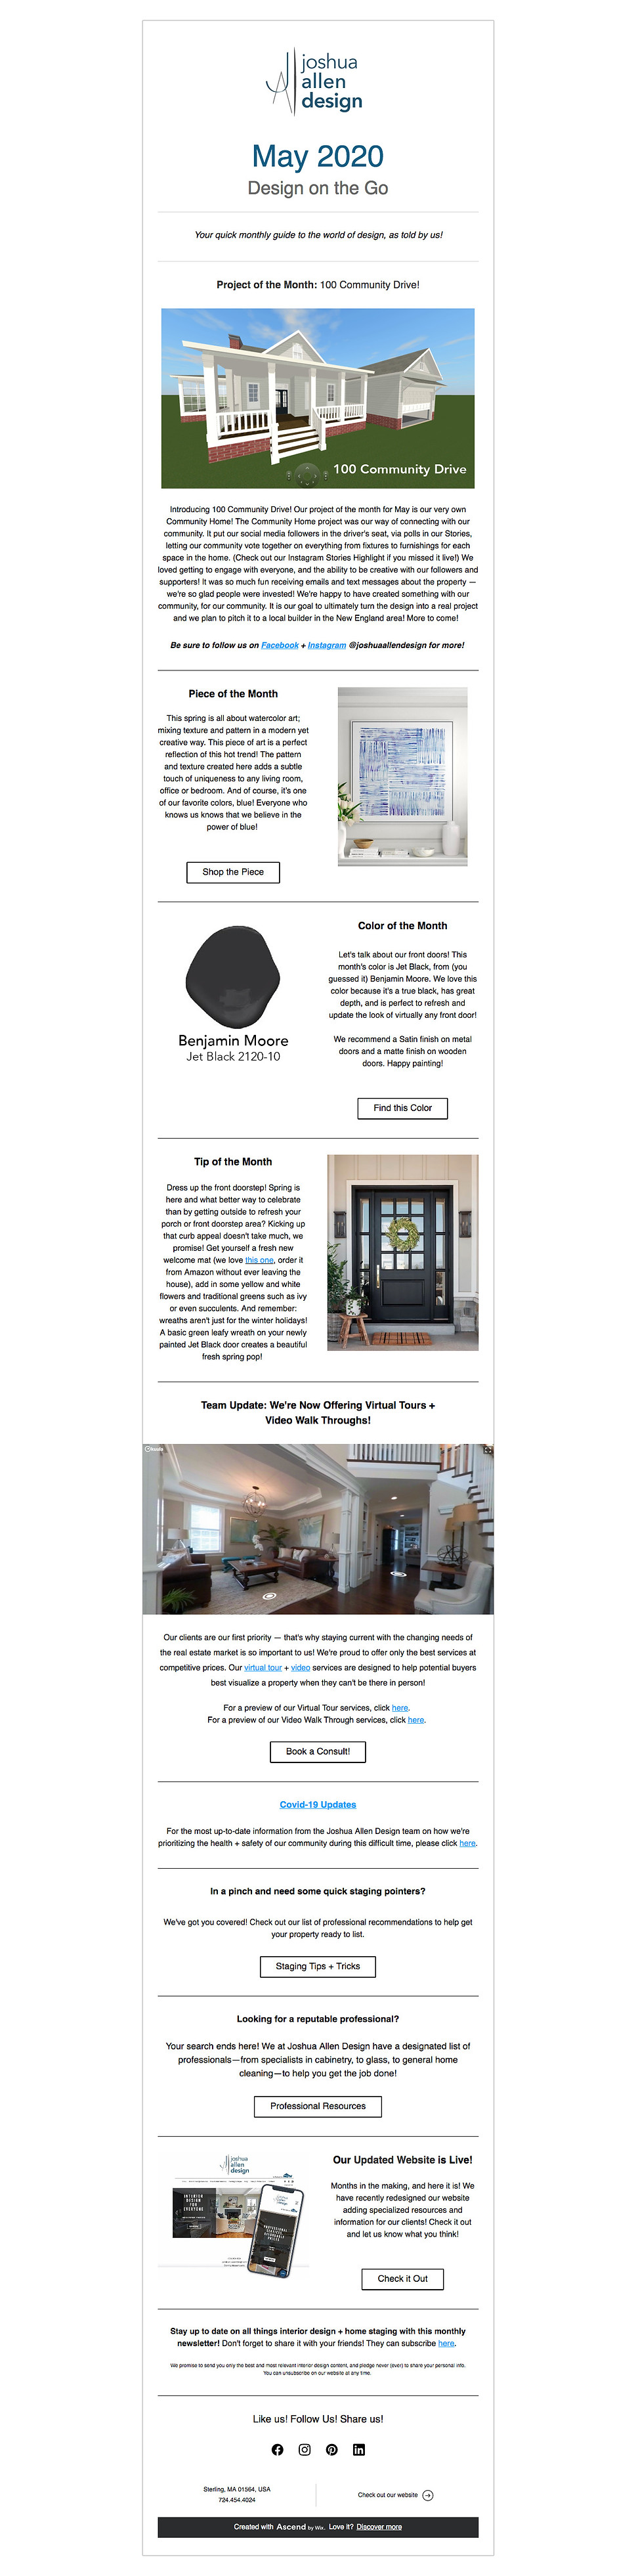 Screenshot_2020-11-10 May 2020 Design on